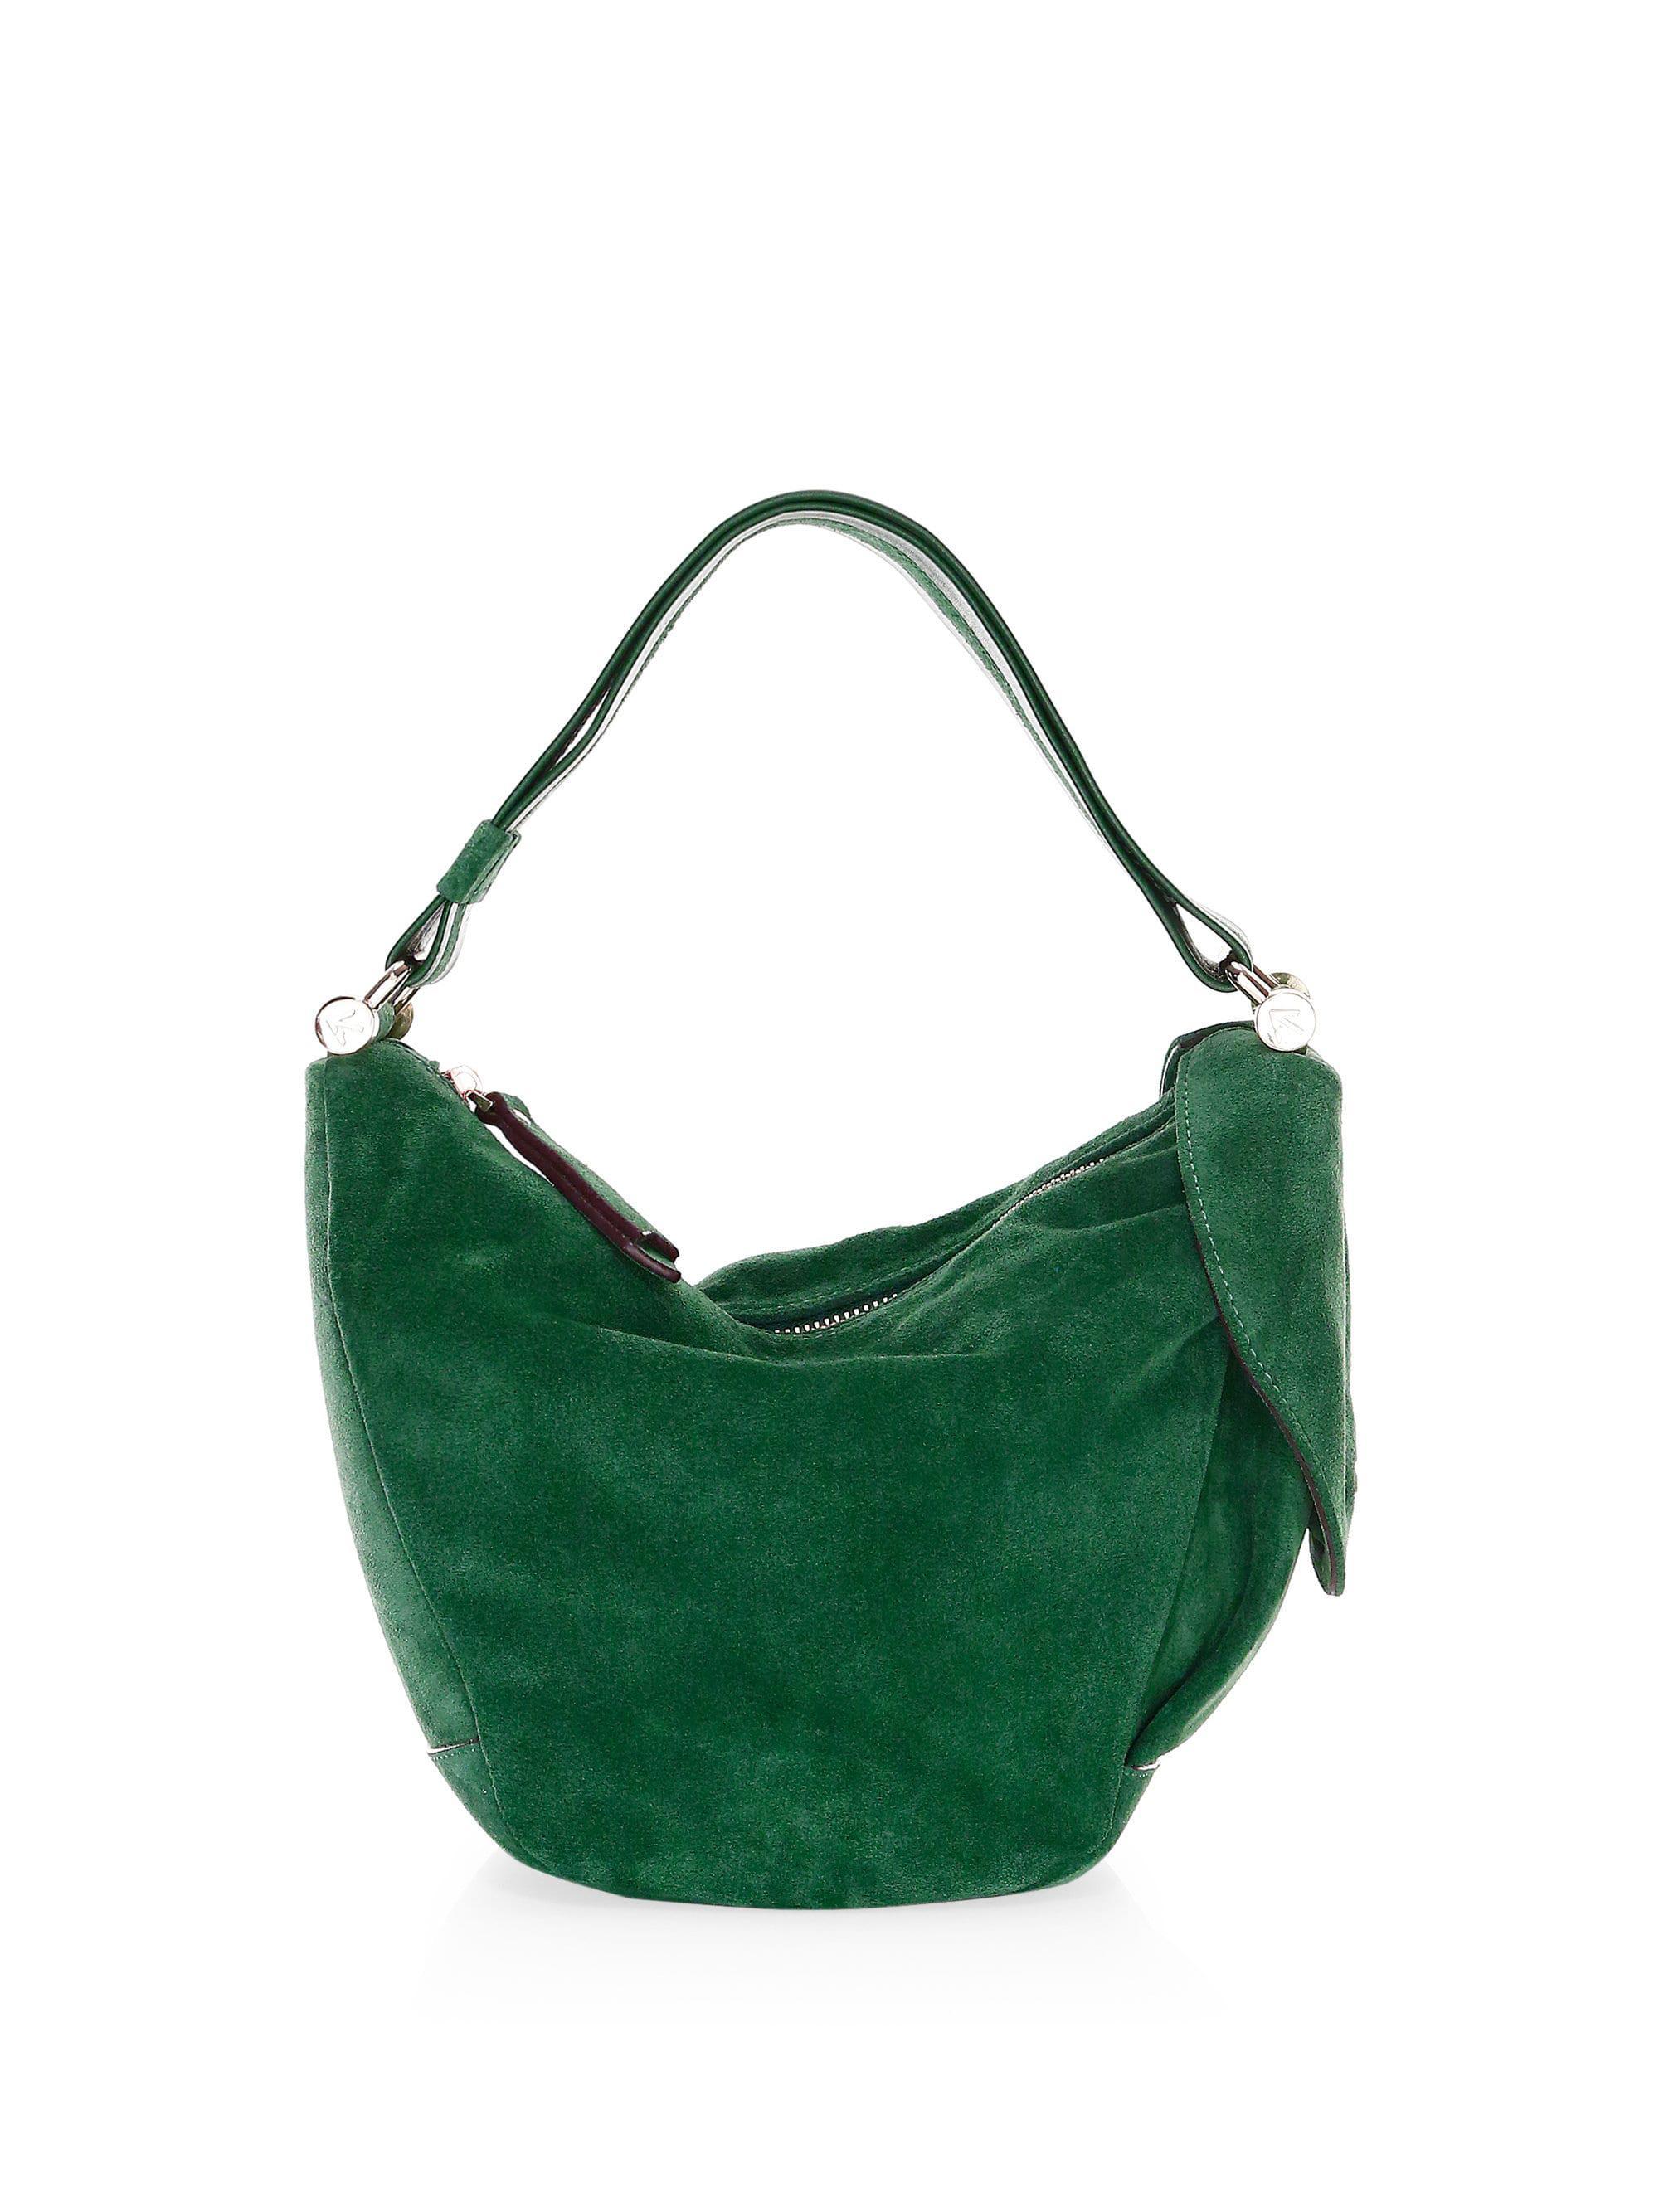 Manu Atelier Micro Fernweh Suede Bucket Bag in Green - Lyst 6d9d0c37090ac